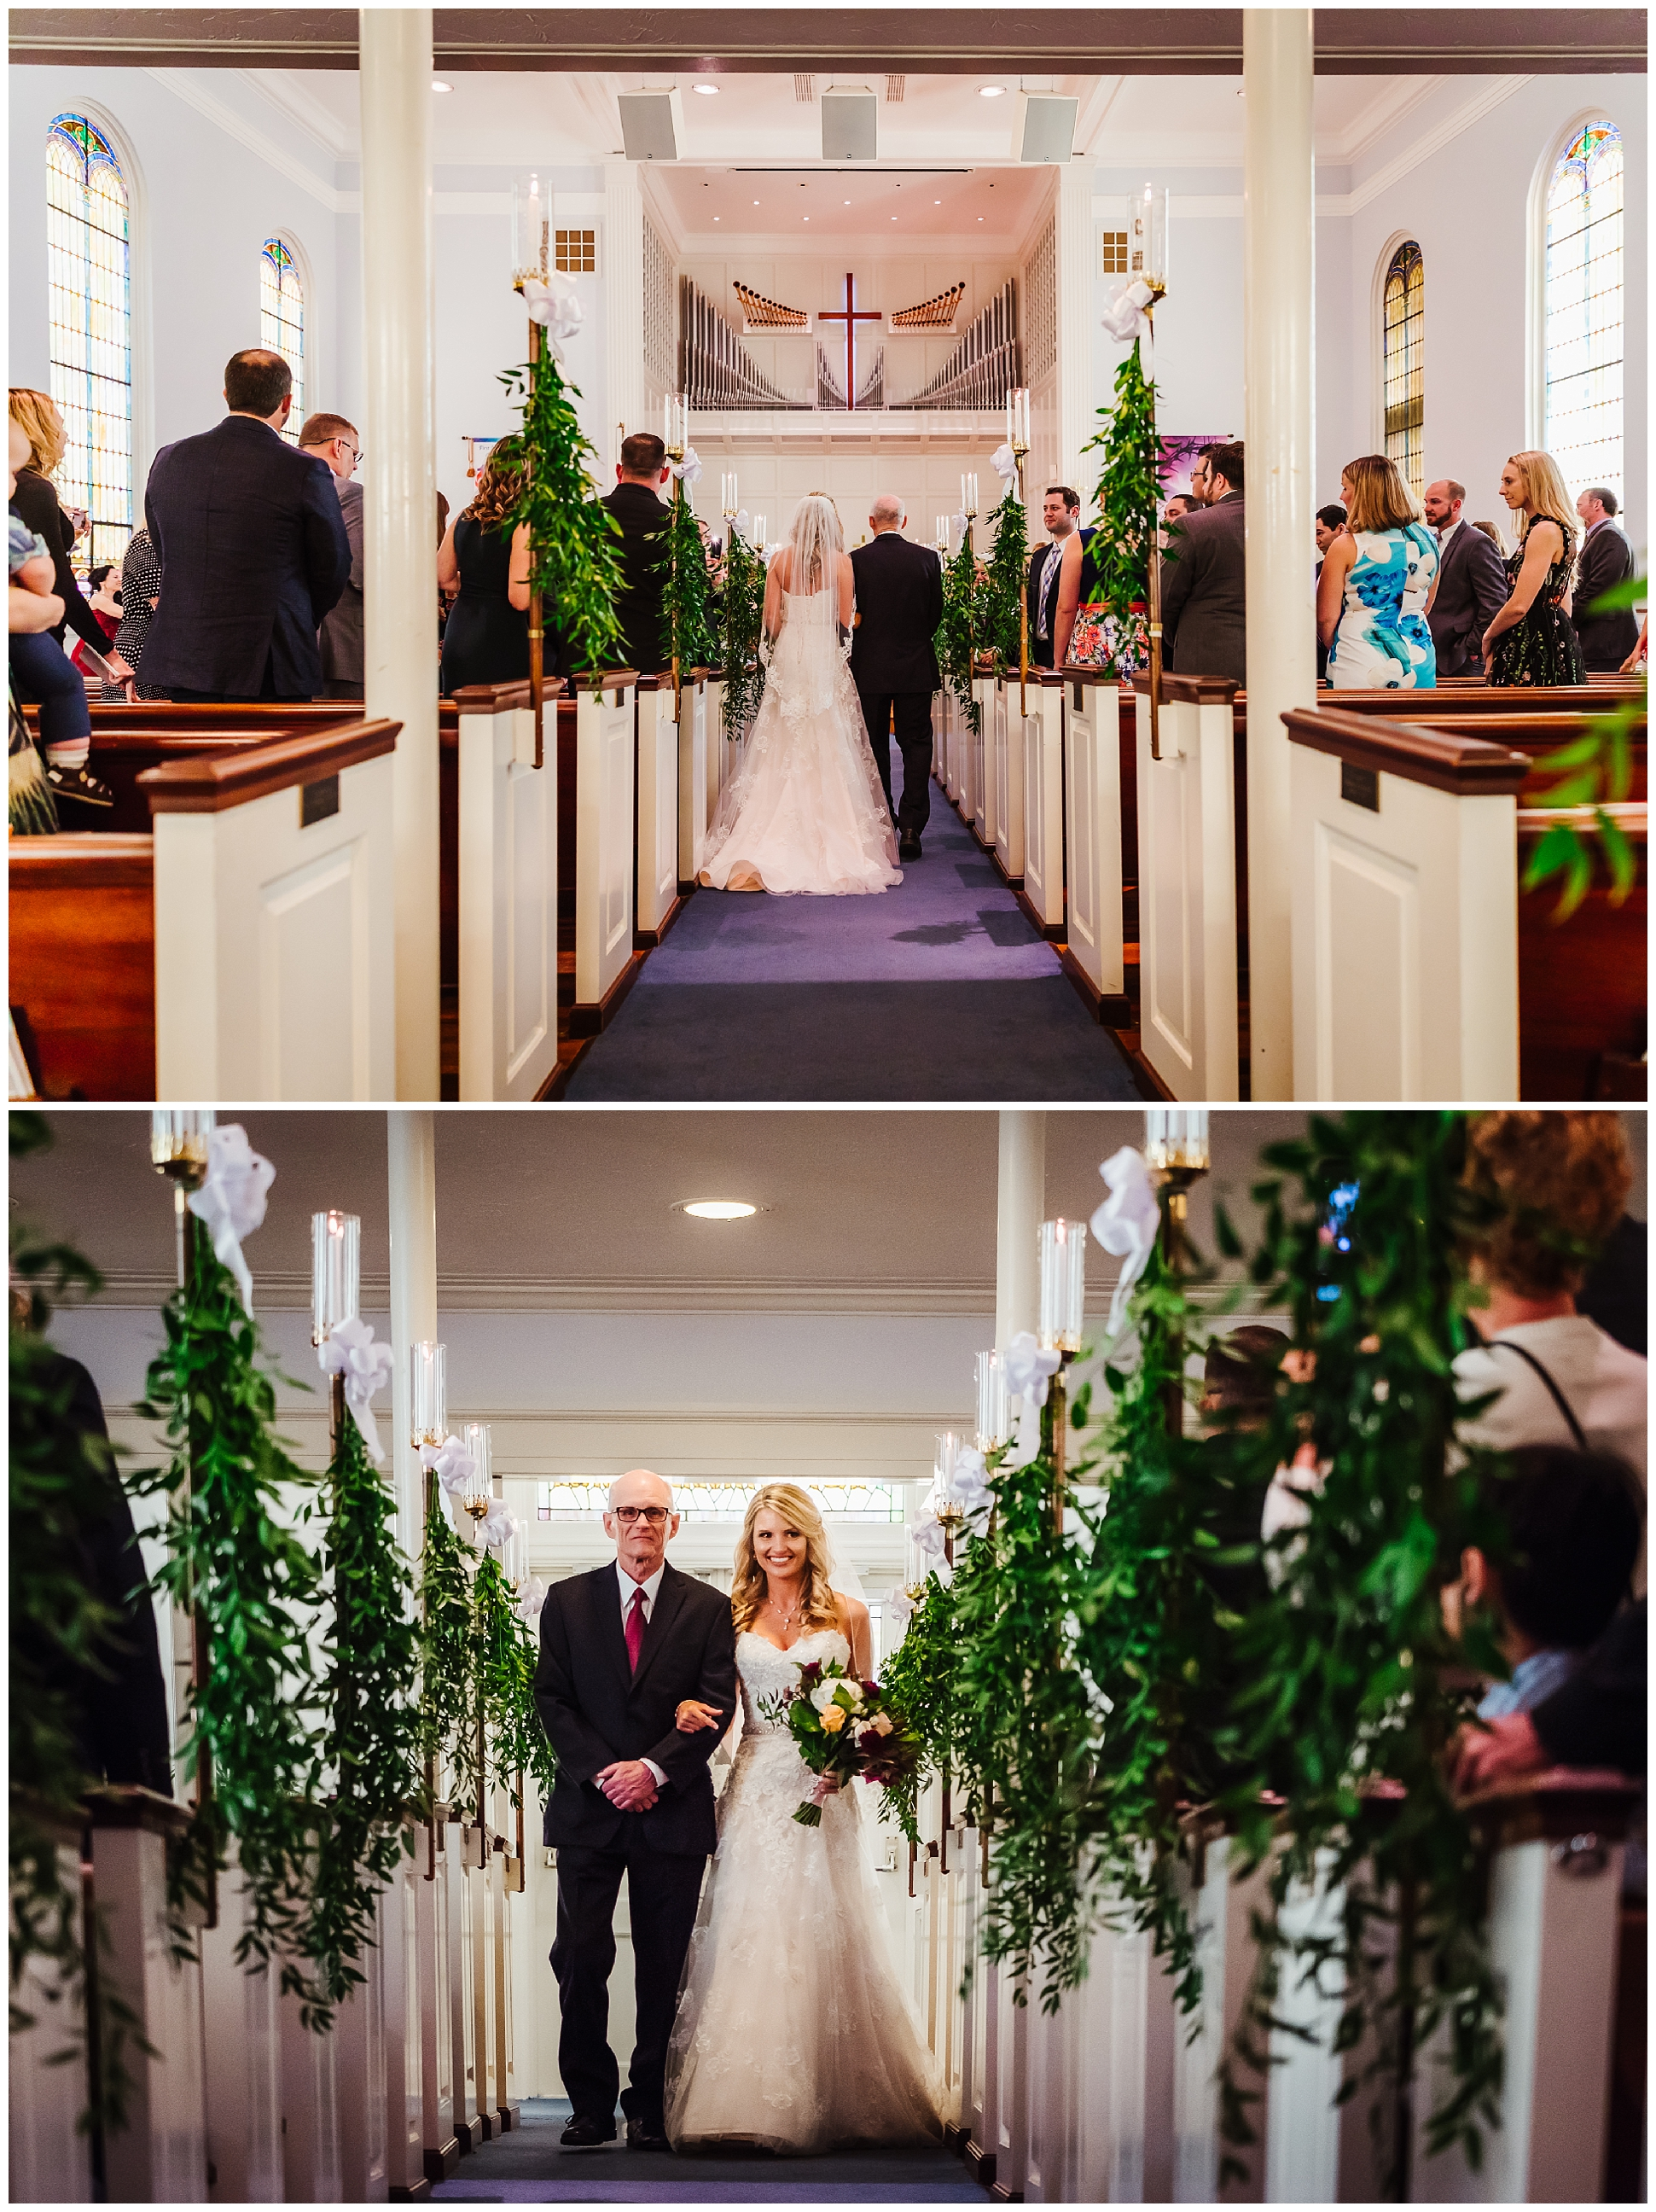 tampa-bradenton-wedding-photographer-south-florida-museum-classic-blush-gold-alpacas-sparklers_0046.jpg